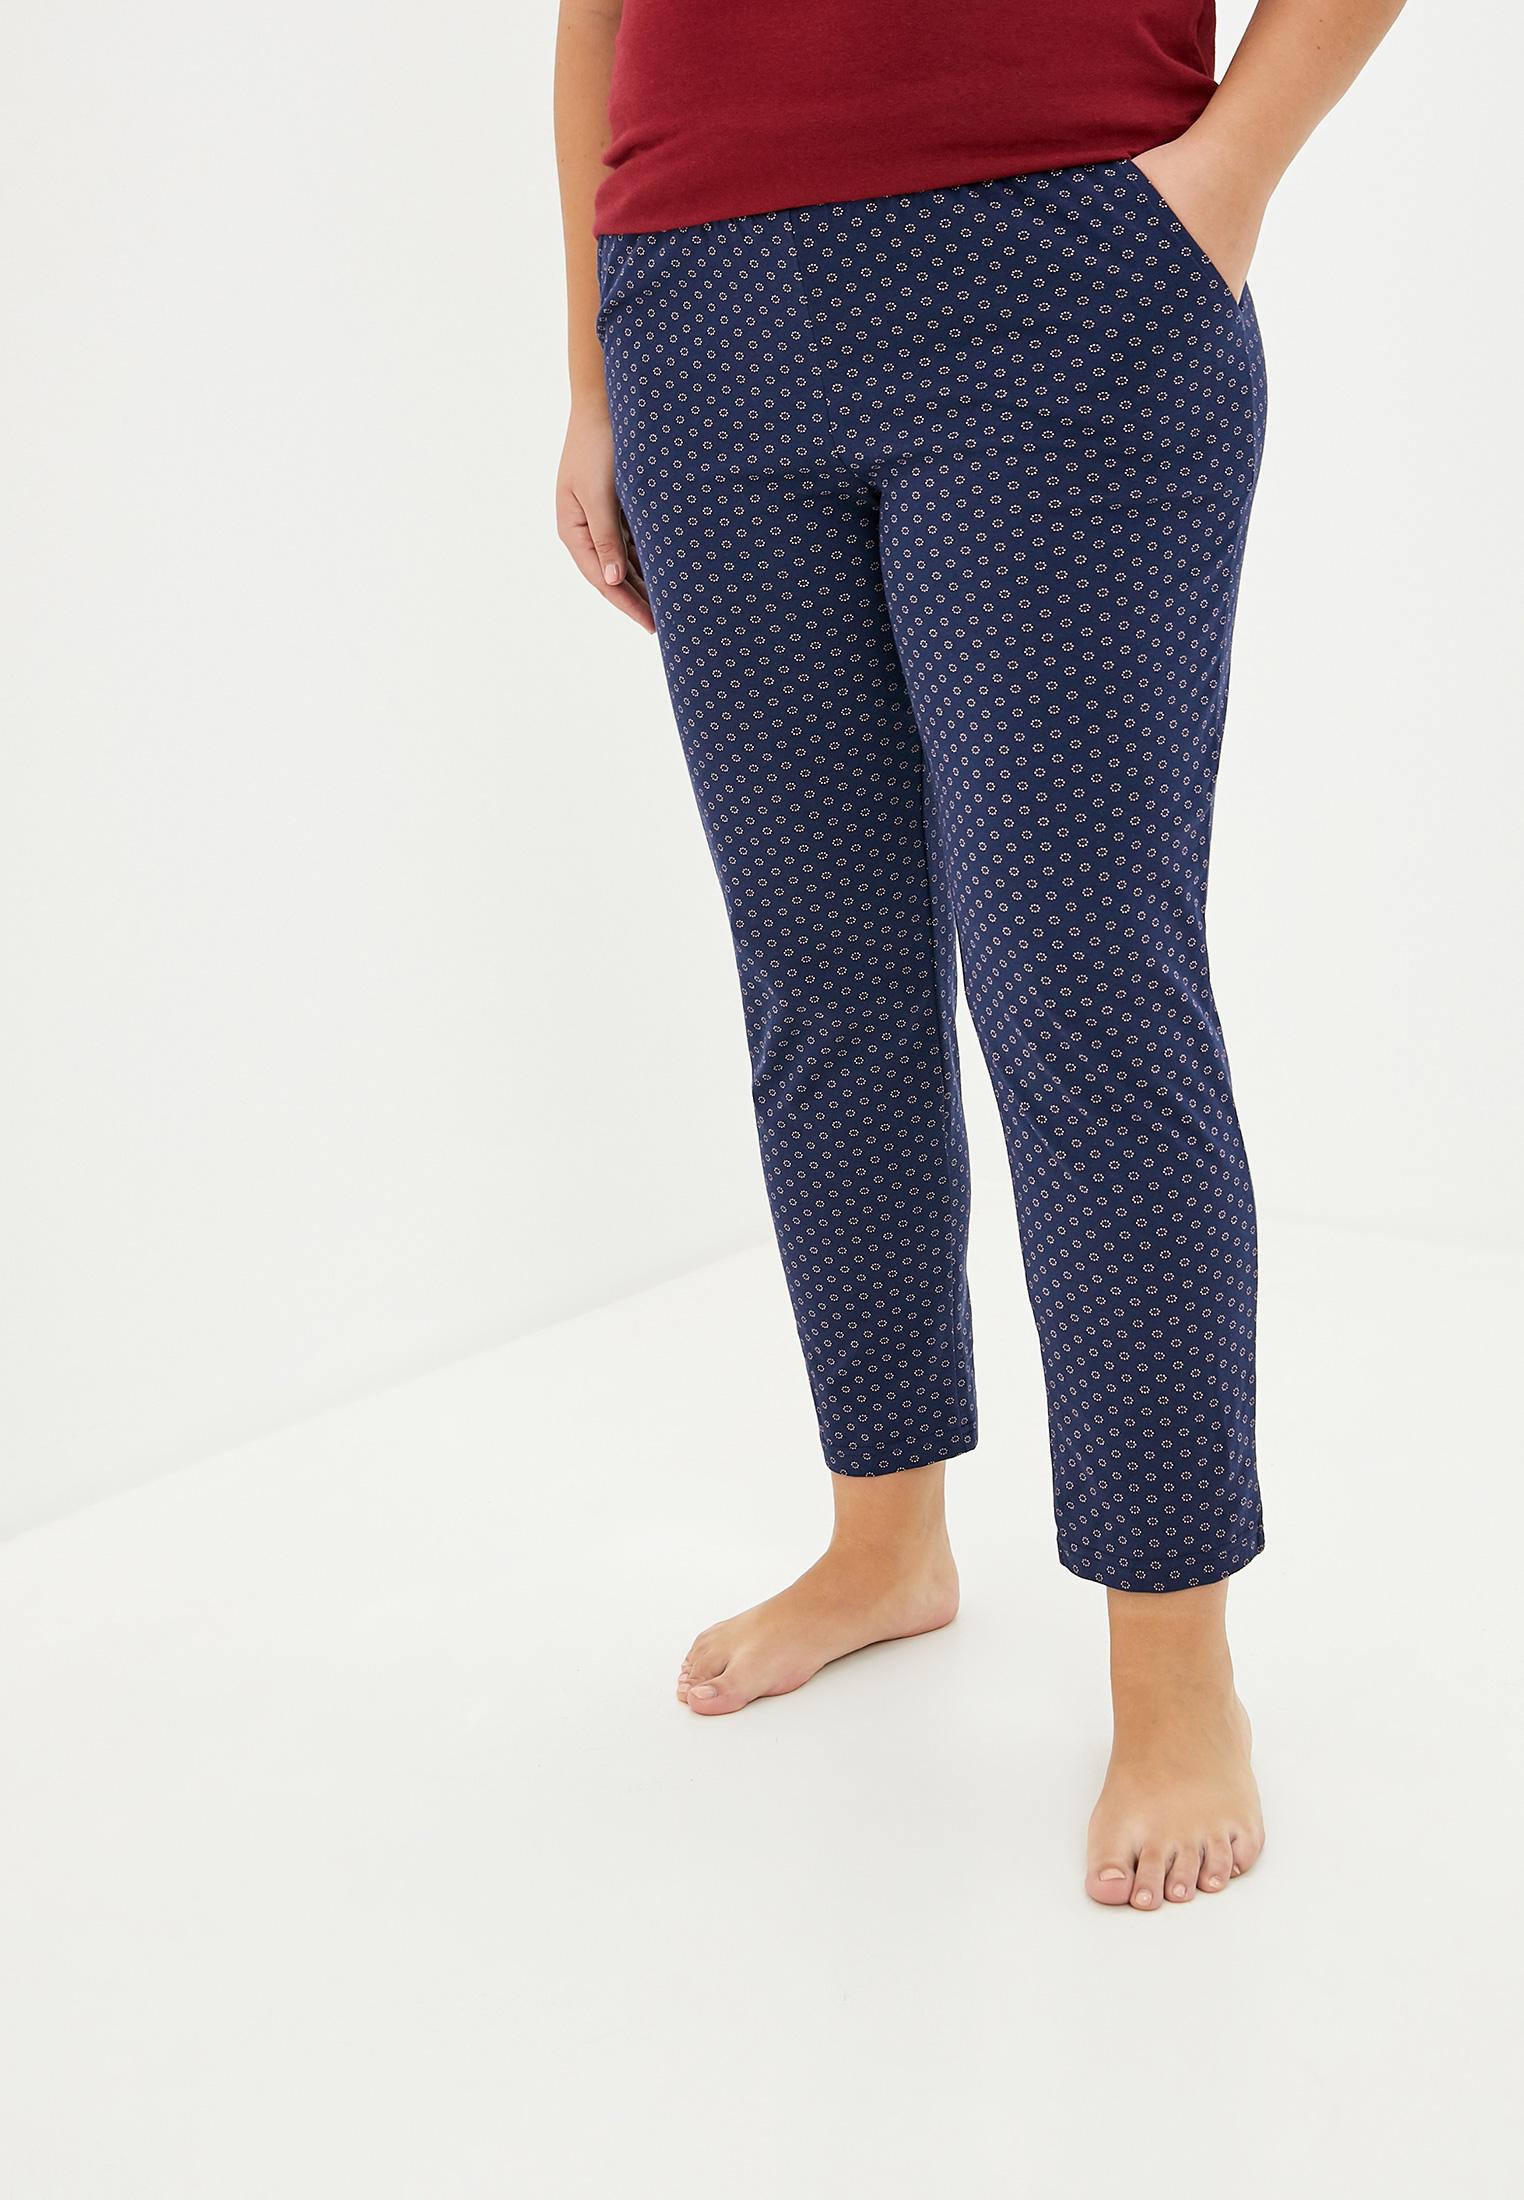 Женские домашние брюки Лори Б326-1